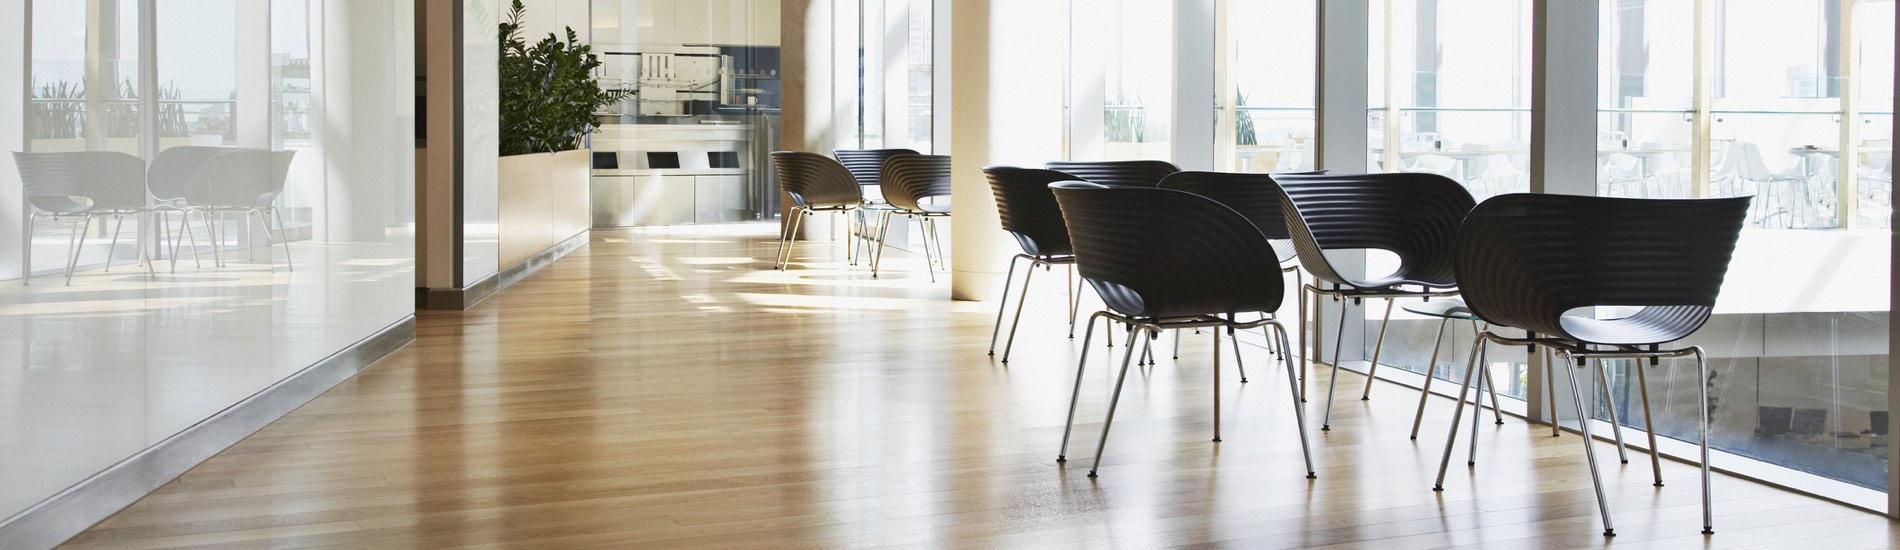 raumconcept objekt raumgestaltung f r b ro. Black Bedroom Furniture Sets. Home Design Ideas